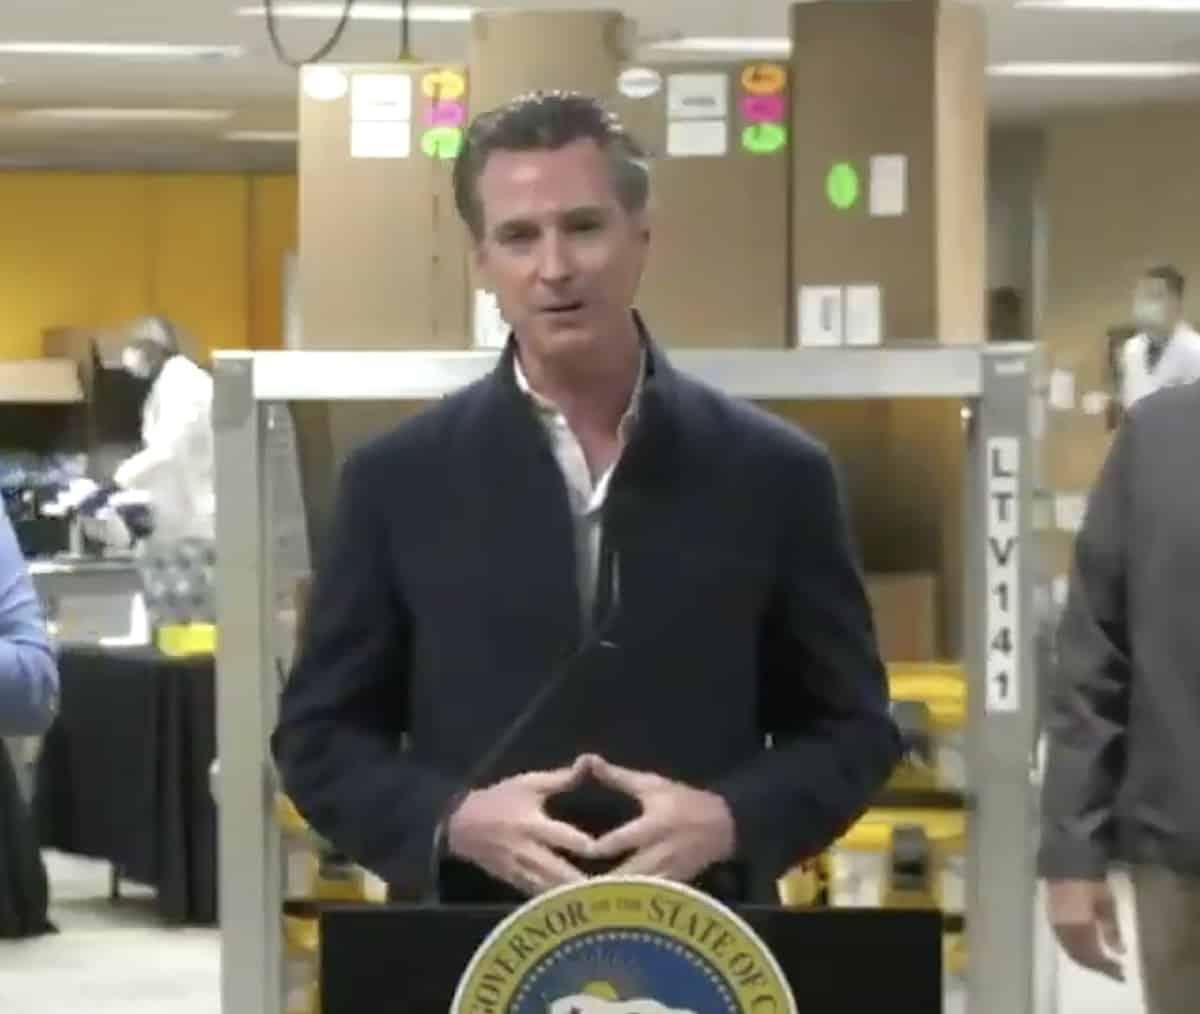 Newsom signs statewide eviction moratorium due to coronavirus